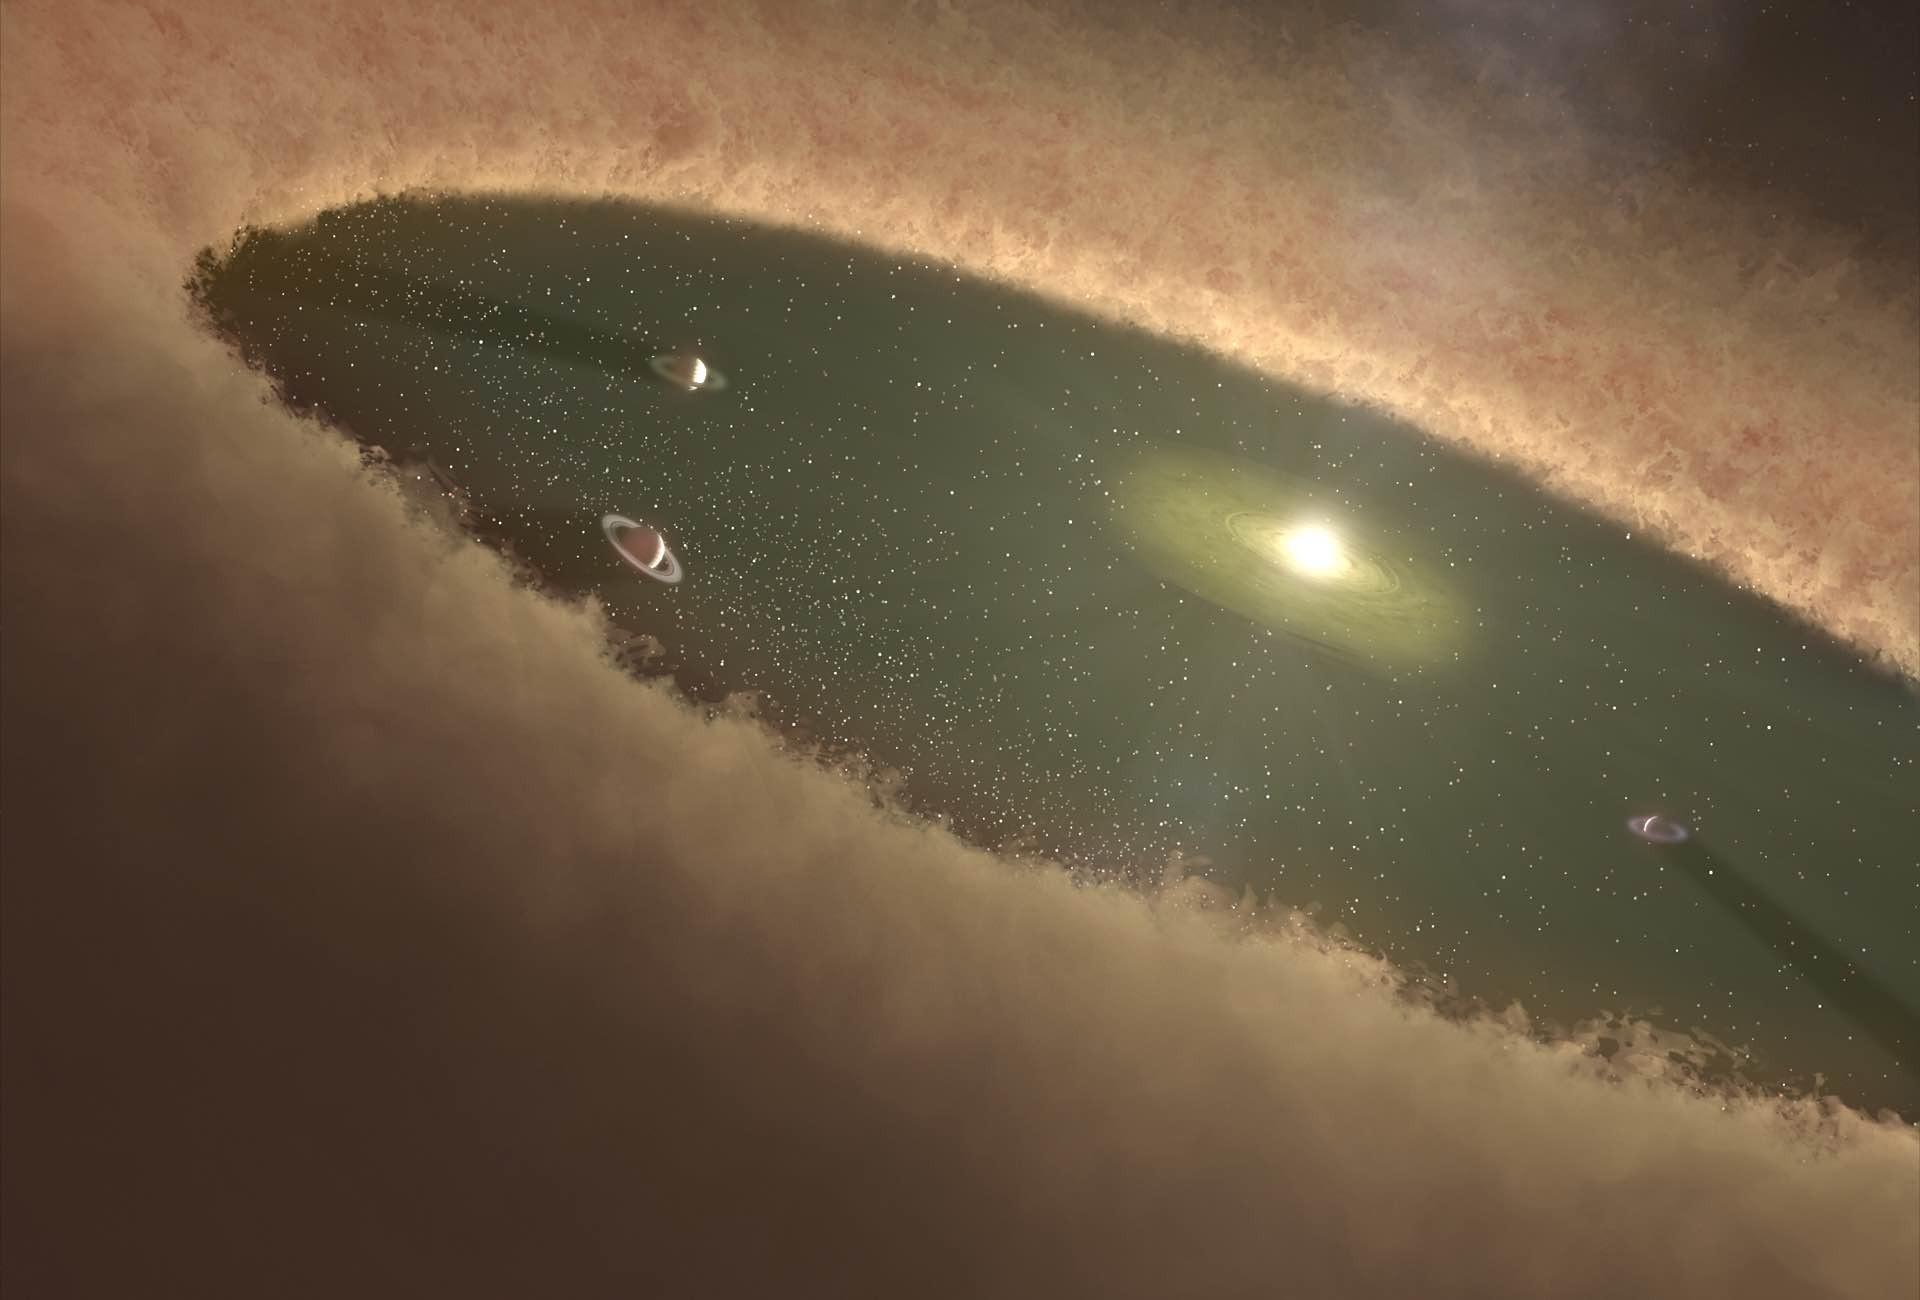 Concept art: NASA/JPL-Caltech